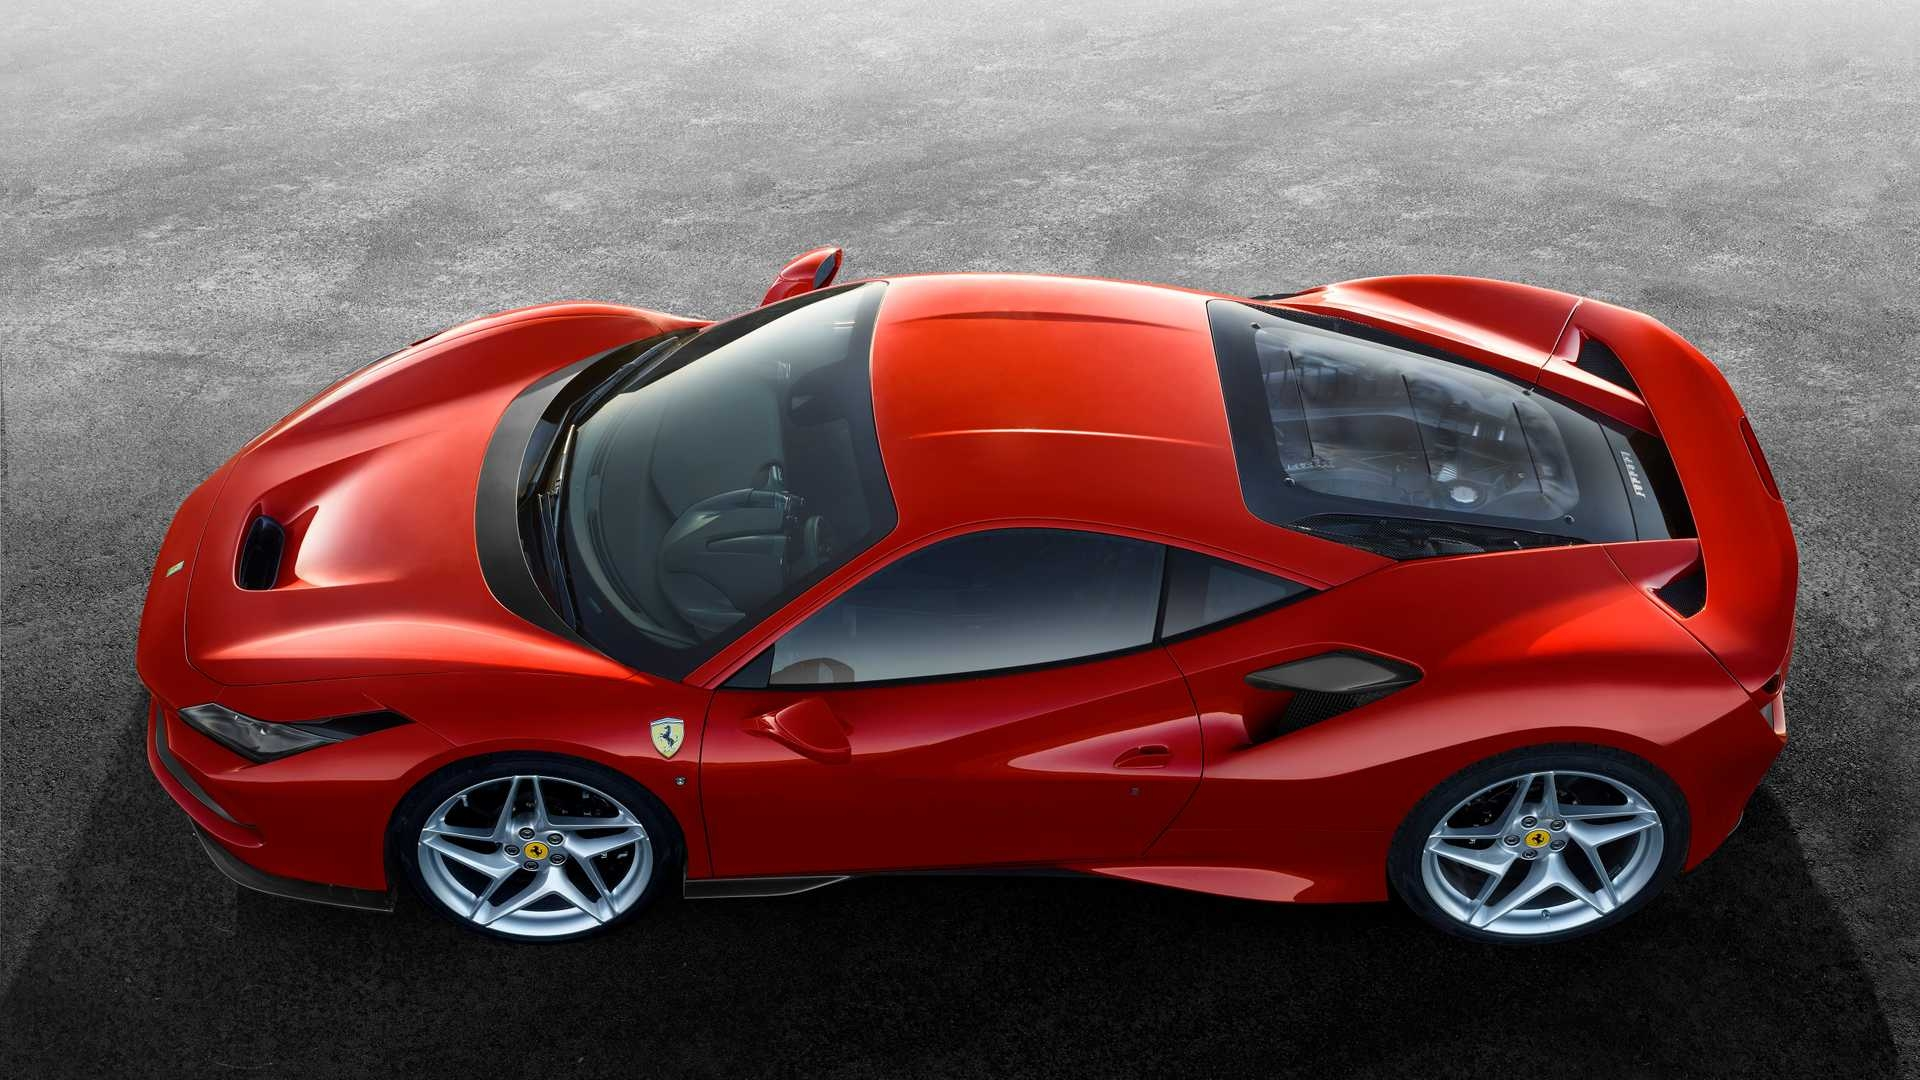 Ferrari представит несколько новинок до конца 2019 года